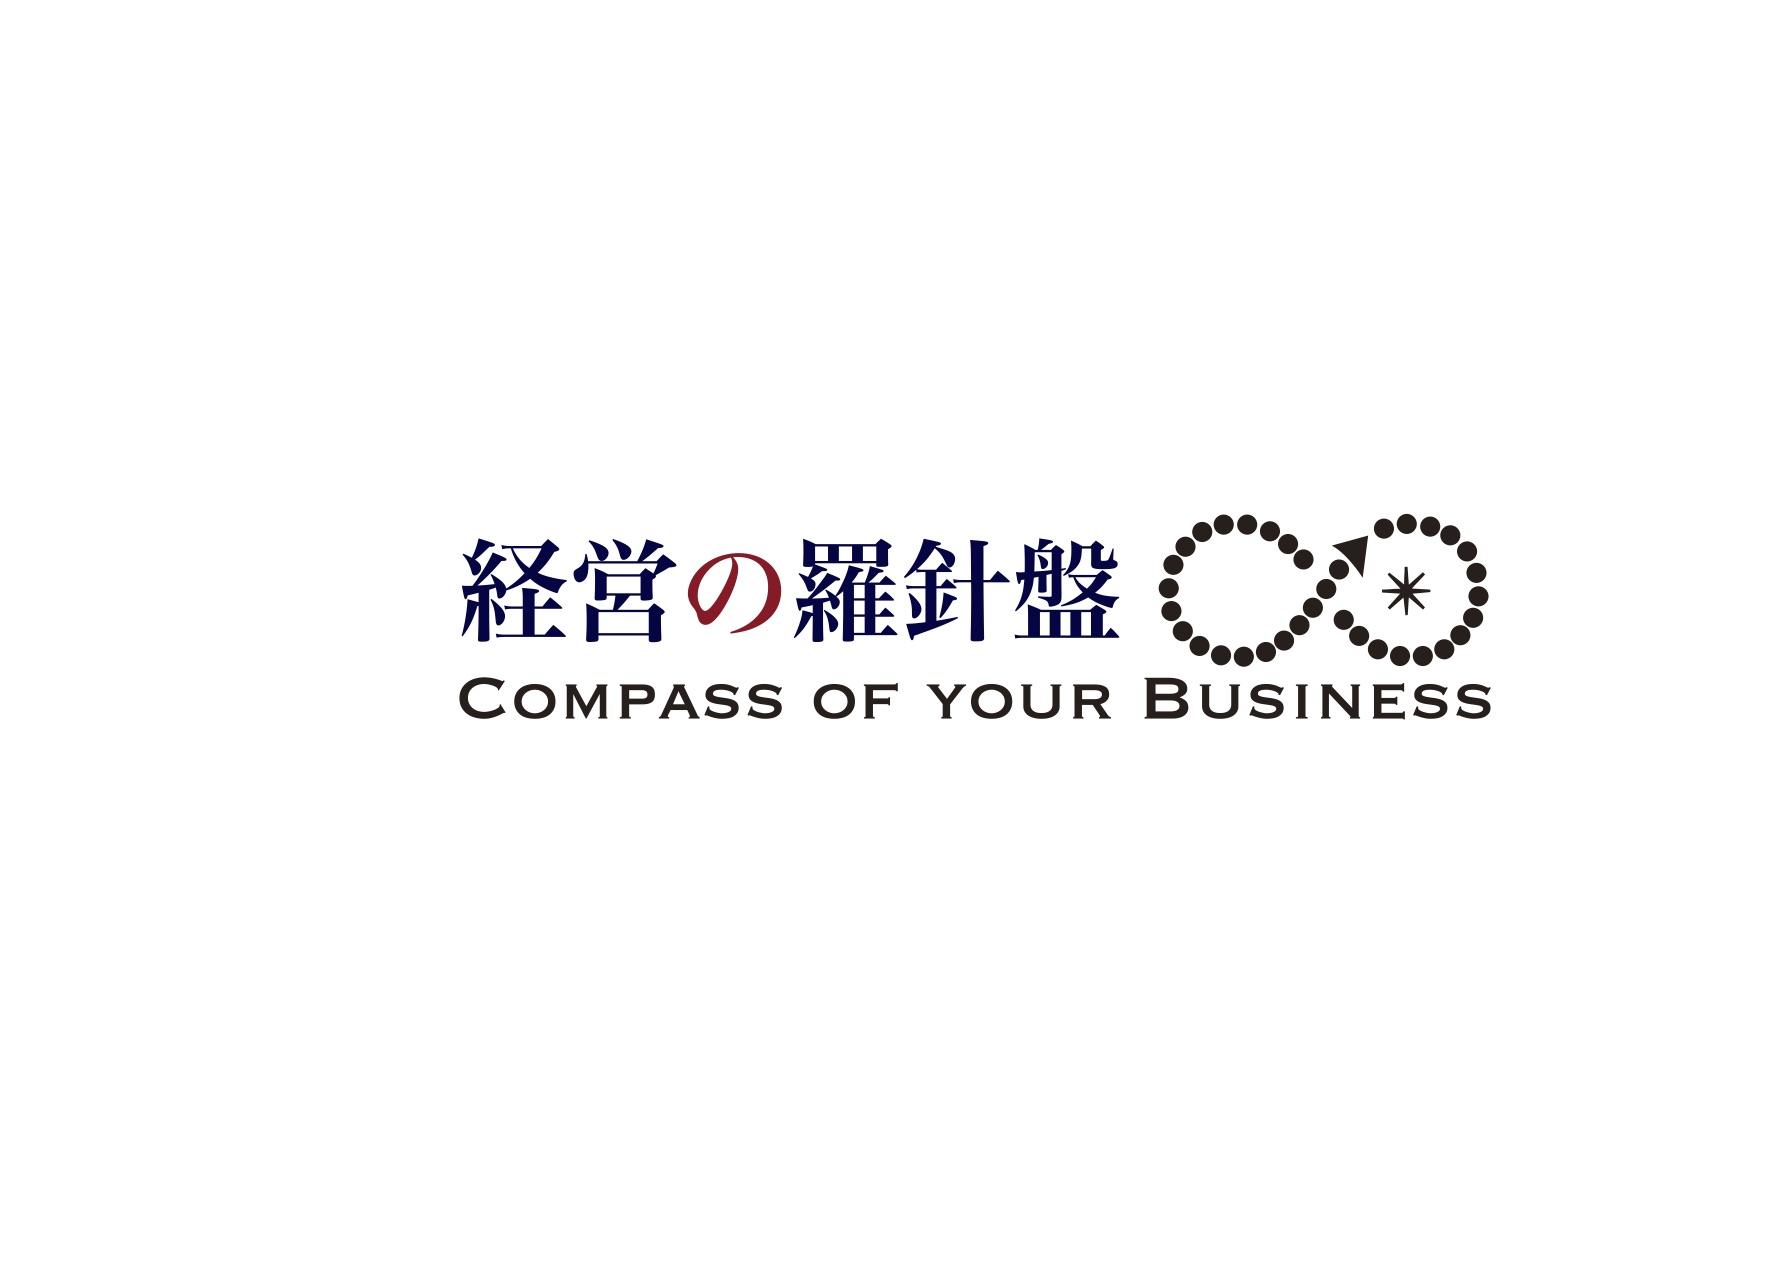 http://www.businessjin.com/report/images/%E7%B5%8C%E5%96%B6%E3%81%AE%E7%BE%85%E9%87%9D%E7%9B%A4CI.jpg